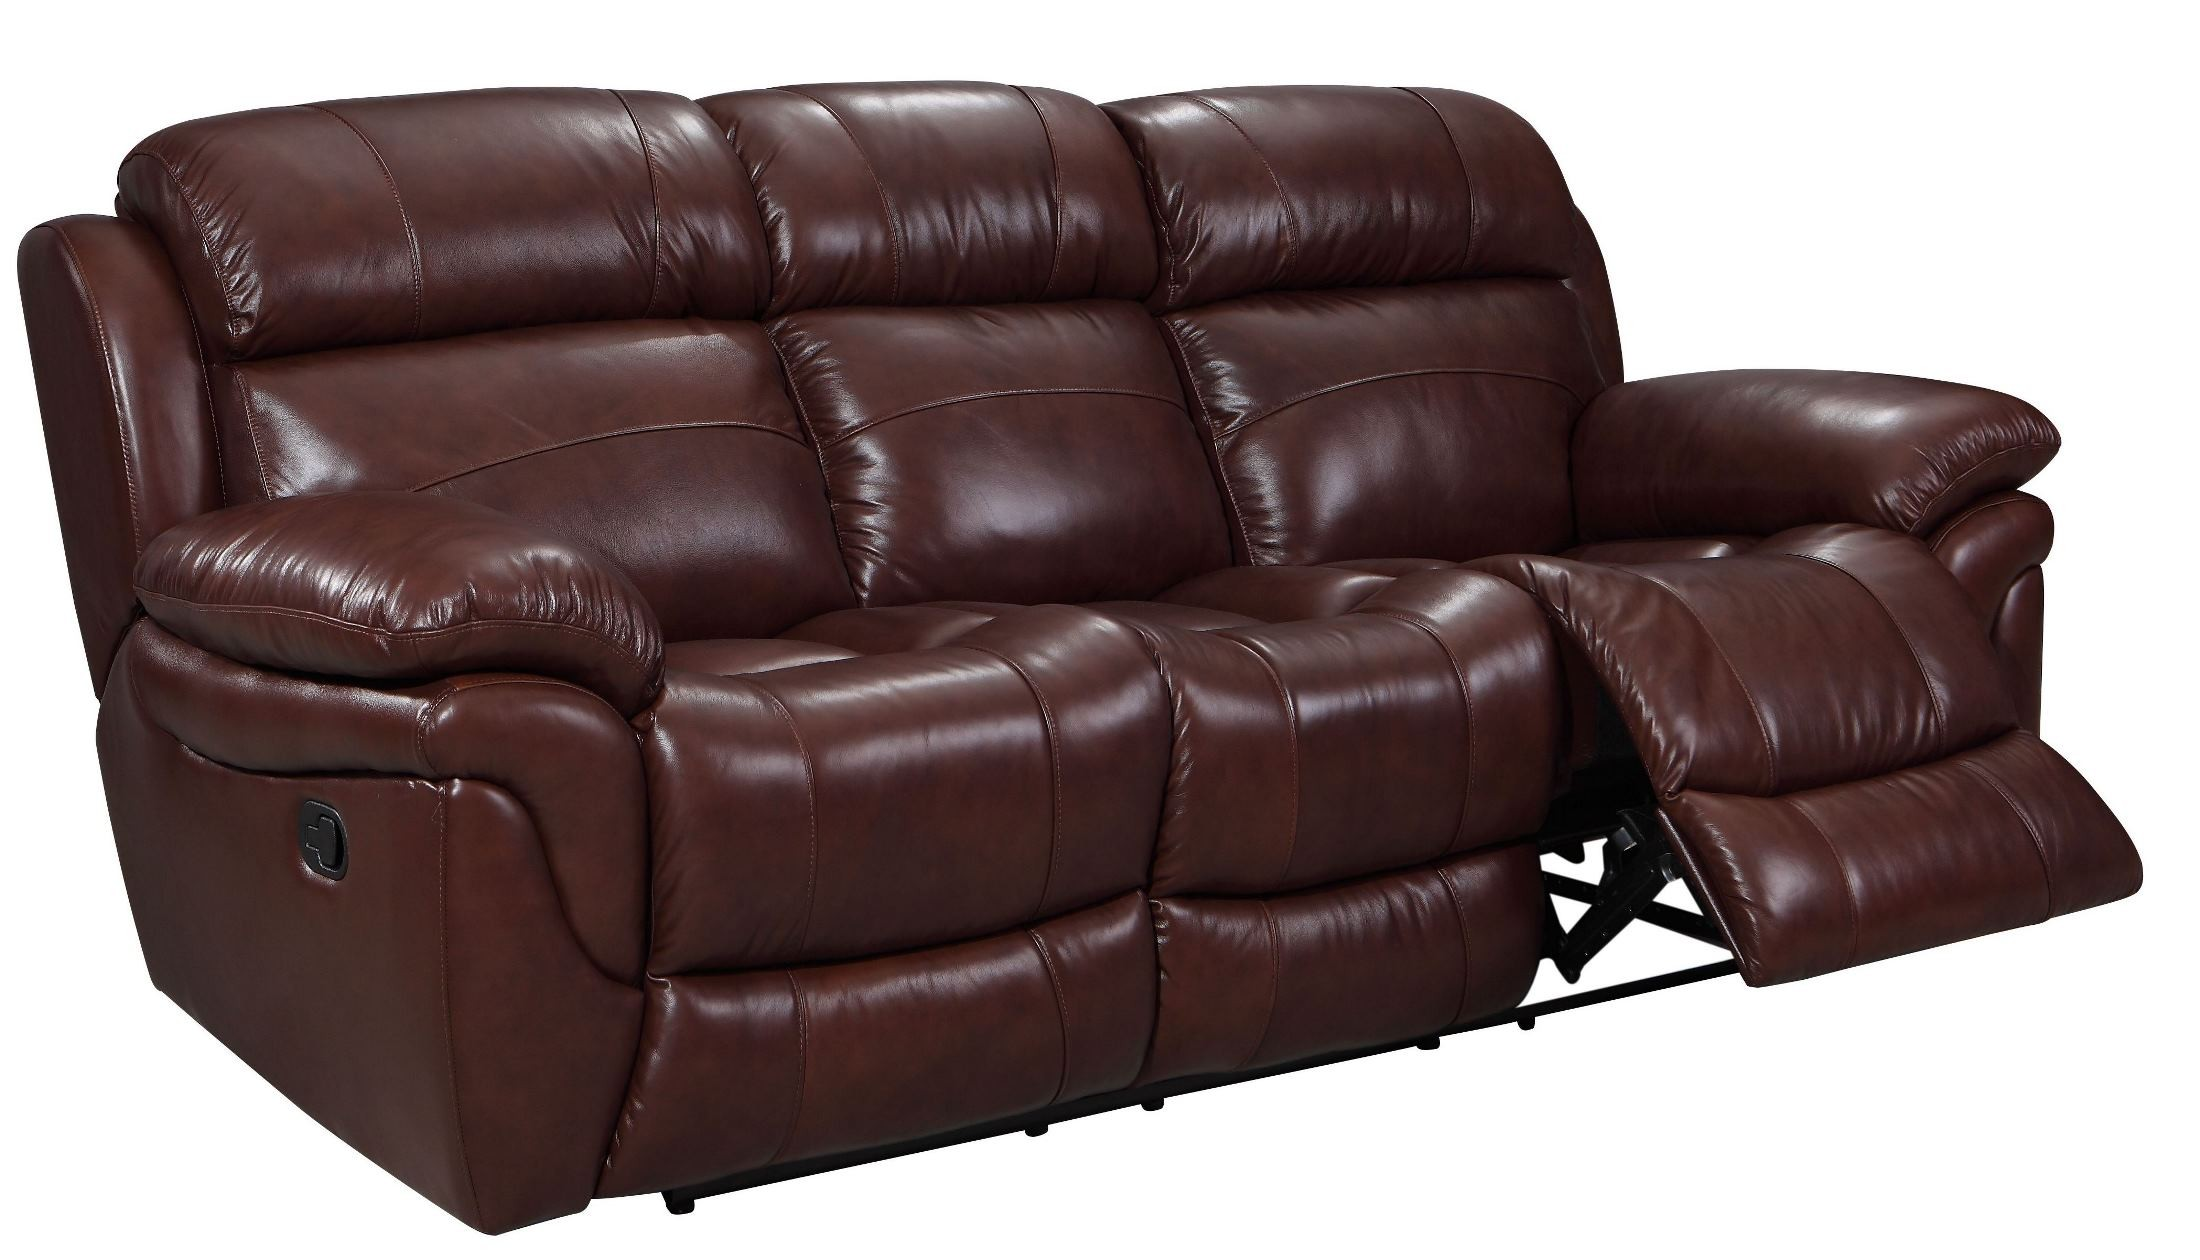 edinburgh brown leather power reclining sofa 1555 e2201 033520lv leather italia. Black Bedroom Furniture Sets. Home Design Ideas